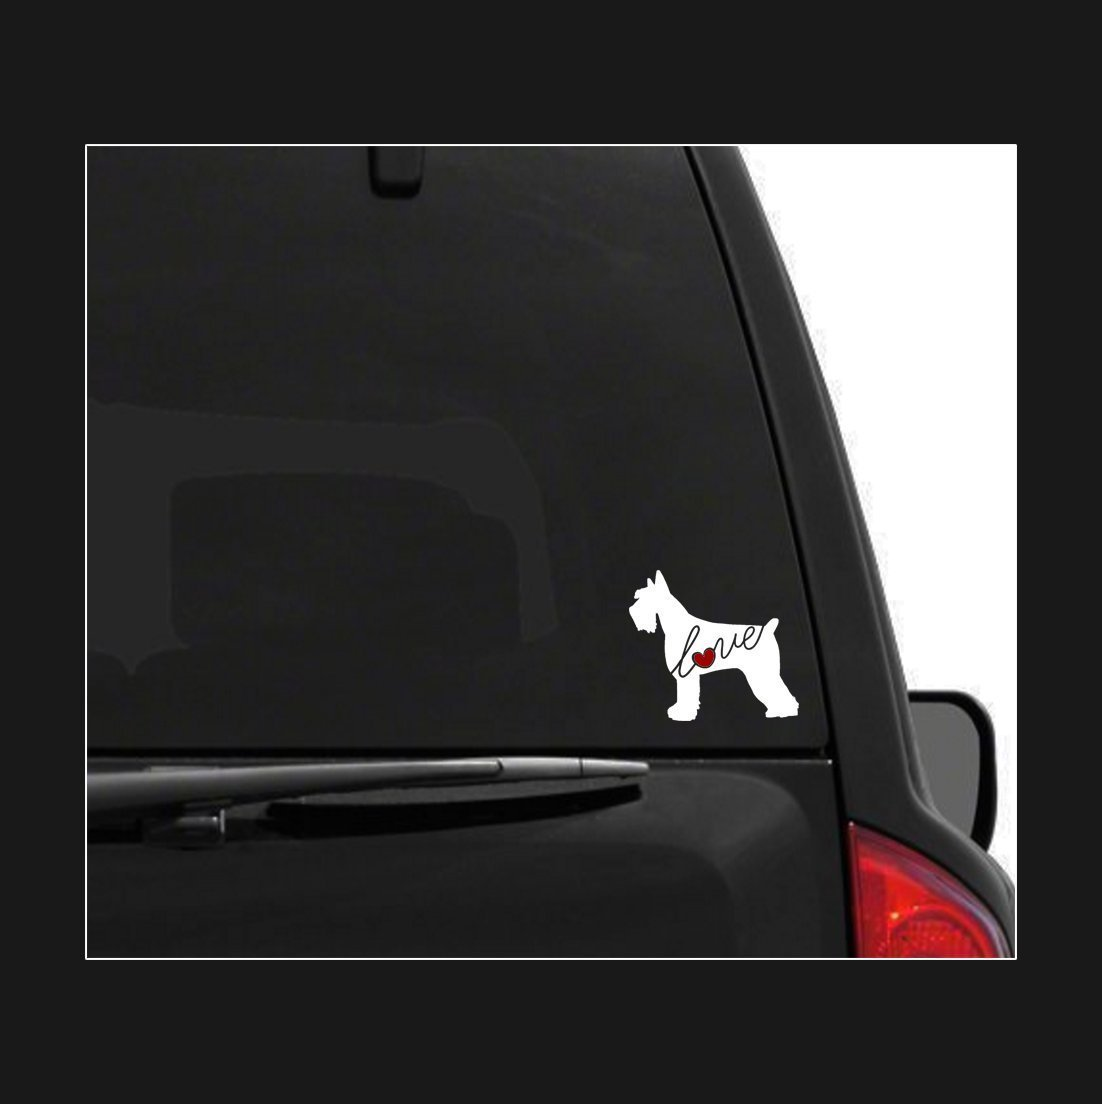 Car Window Vinyl Decal Sticker Script Font Giant Schnauzer Love